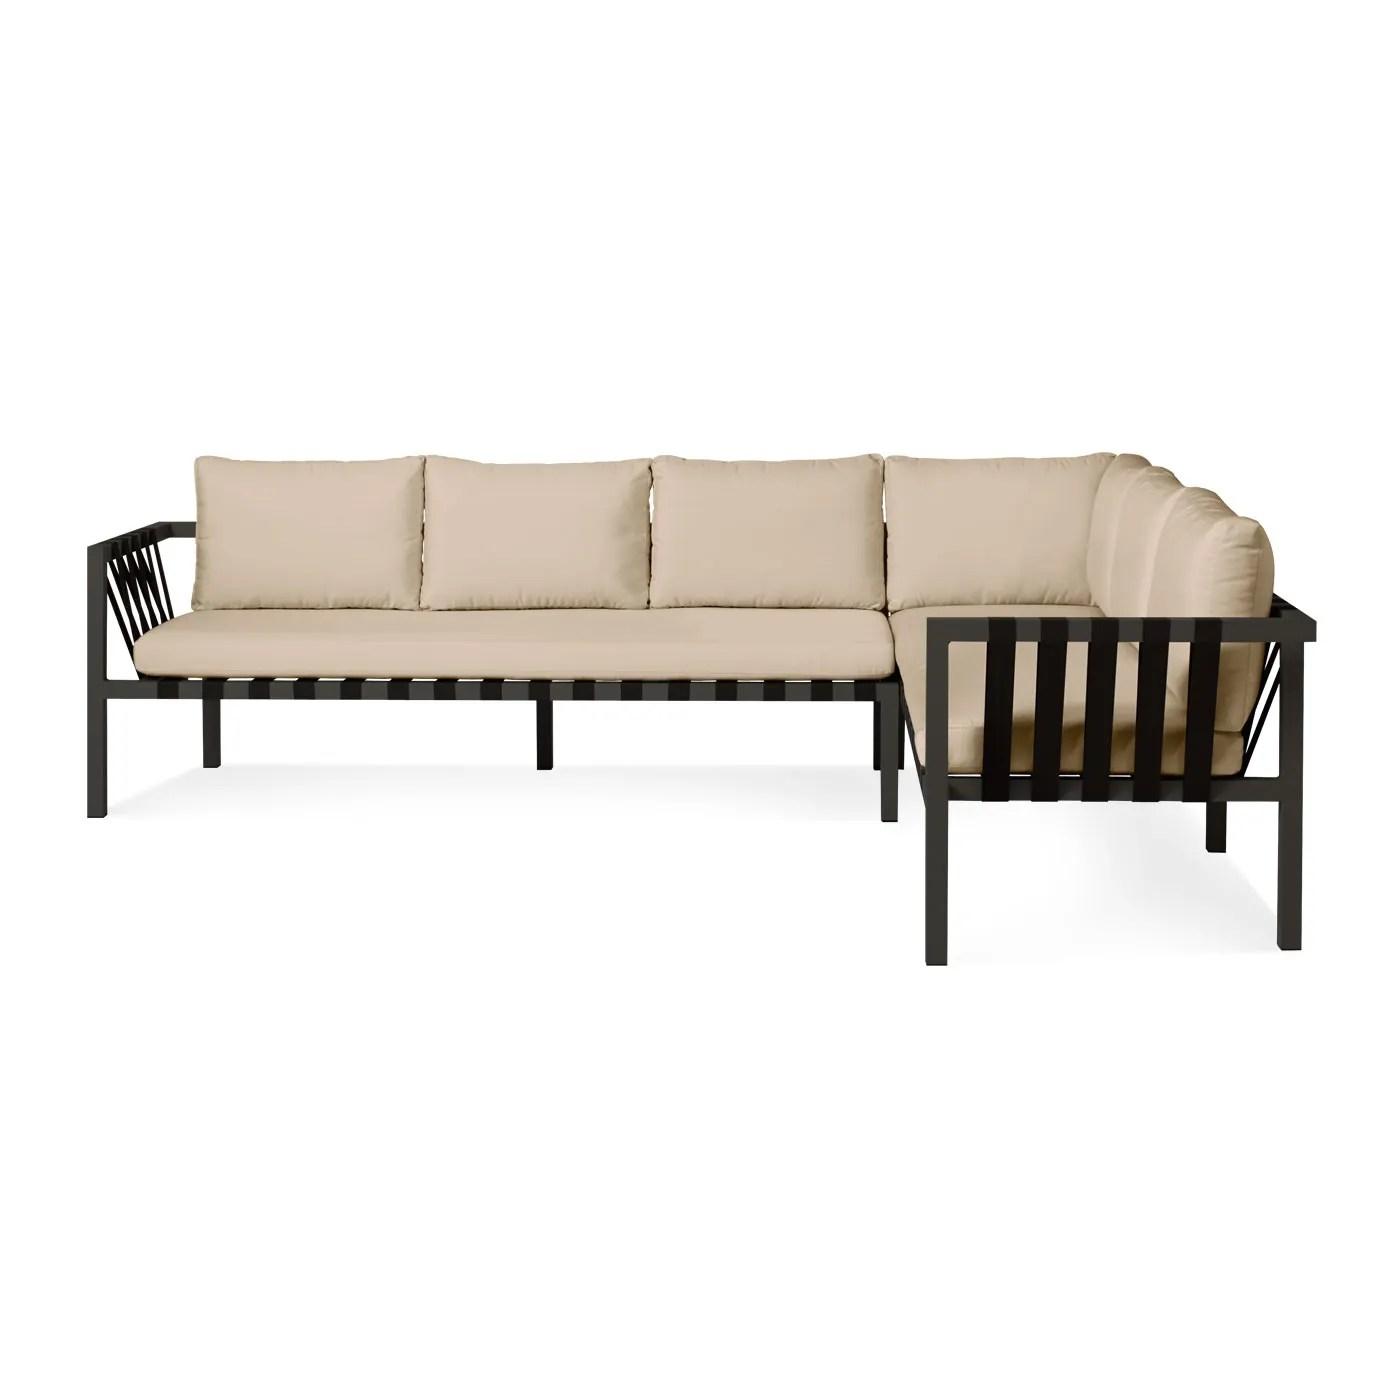 sunbrella fabric sectional sofas orange and black sofa sets jibe 3 seat outdoor modern seating blu dot